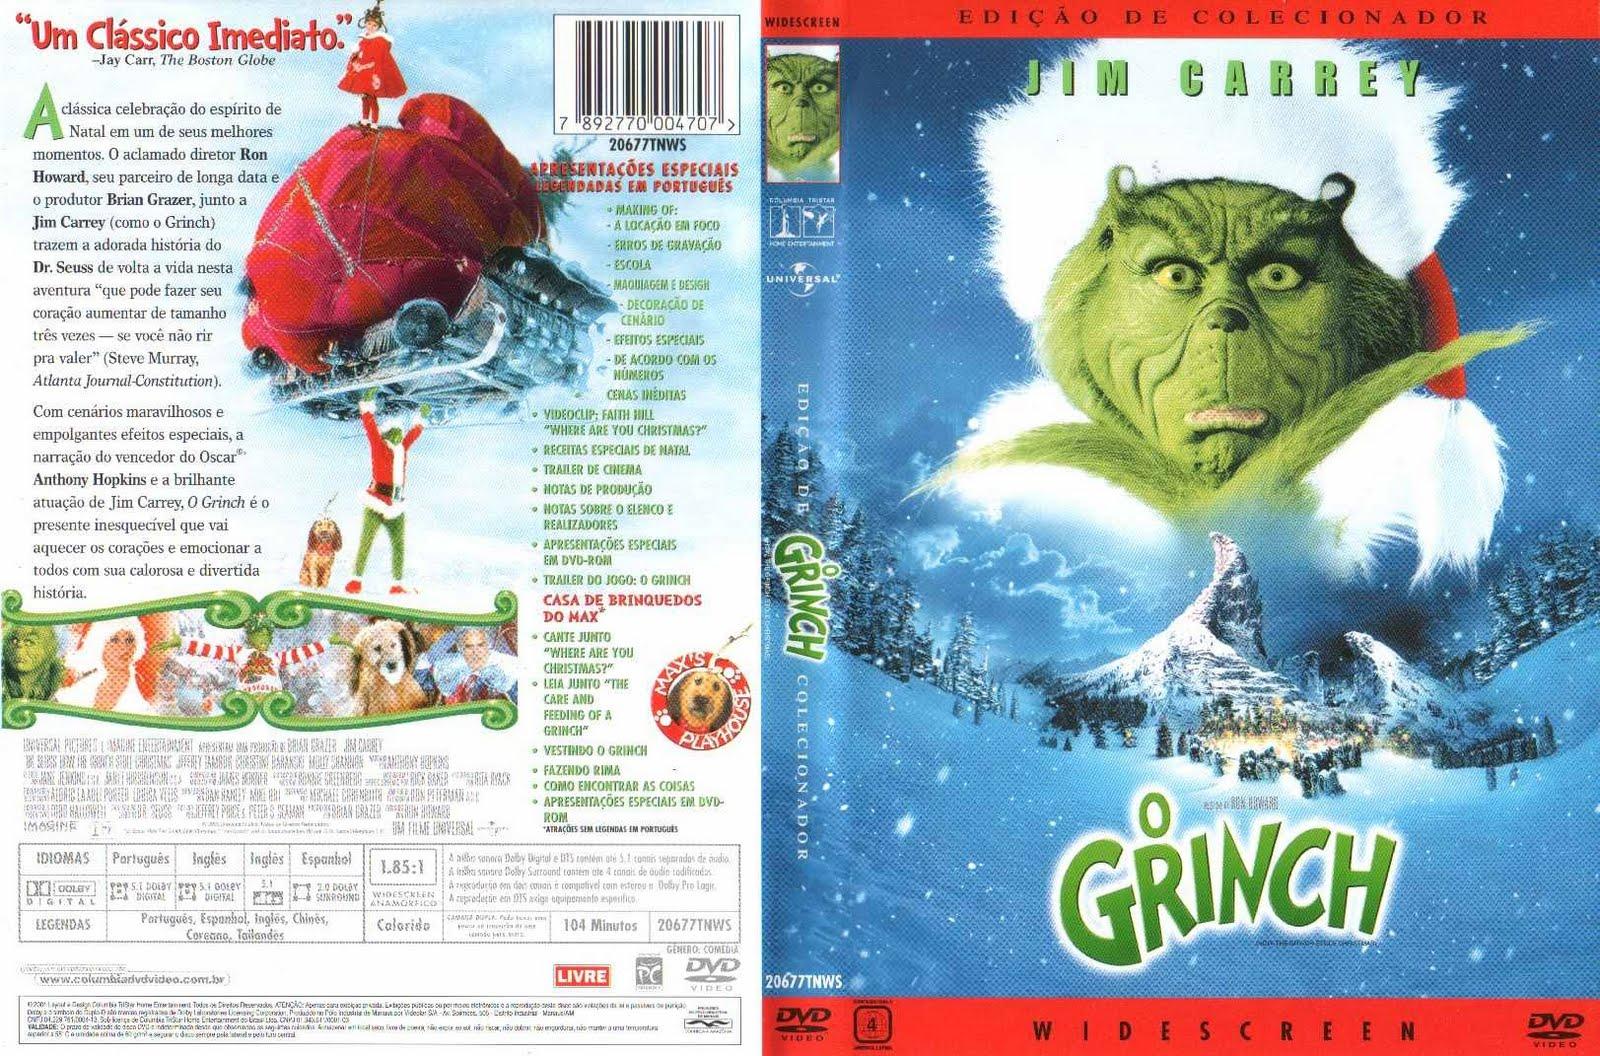 http://1.bp.blogspot.com/-oBif0mxn9fQ/TpjiXft16FI/AAAAAAAAB2U/-3Ao1XLTd0A/s1600/D669%2B-%2BHow_The_Grinch_Stole_Christmas_Brazilian-%255Bcdcovers_cc%255D-front.jpg